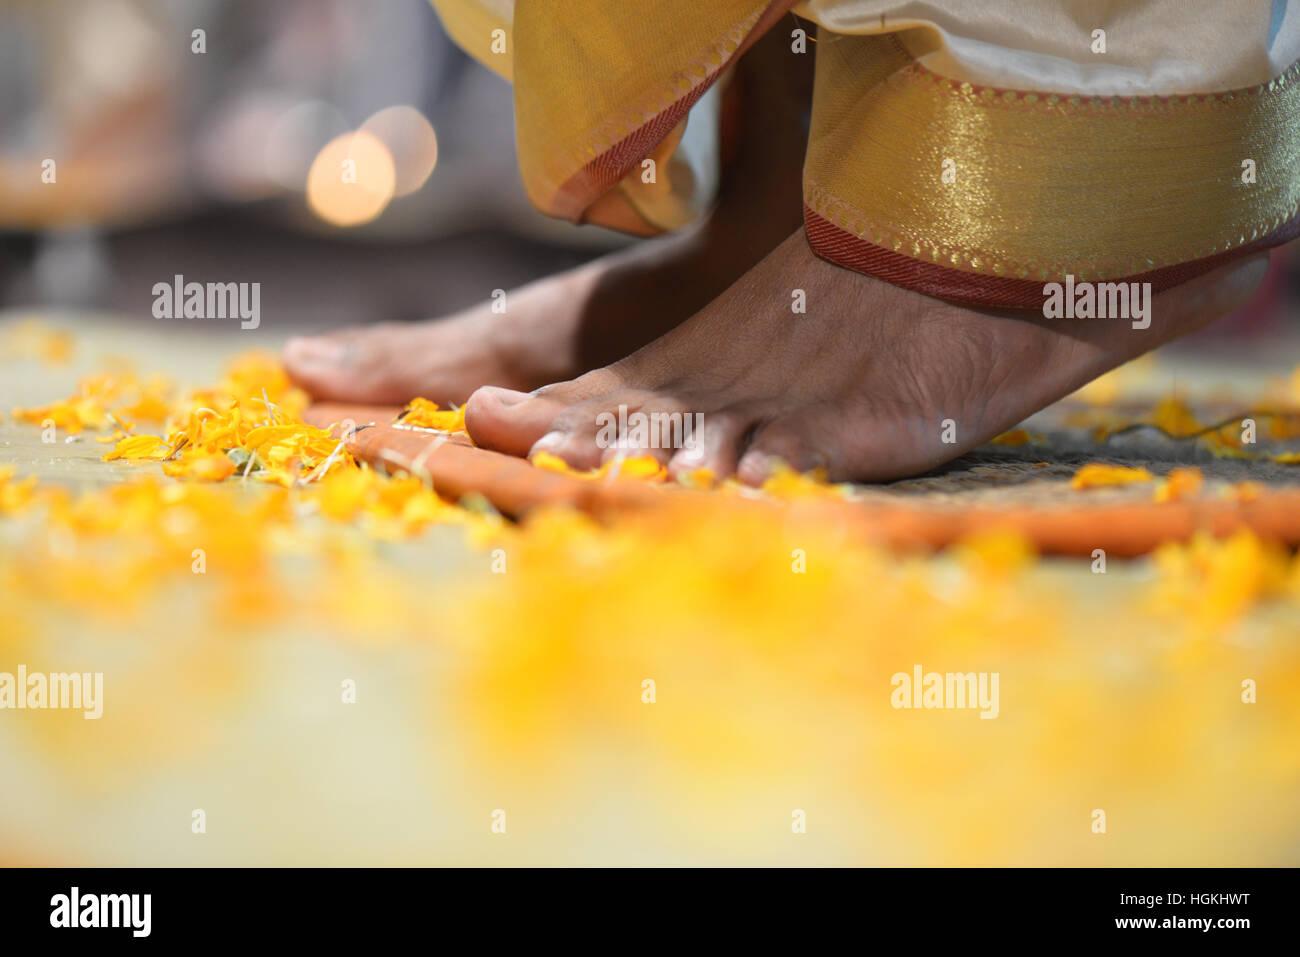 Pies de un ritualista en India Imagen De Stock